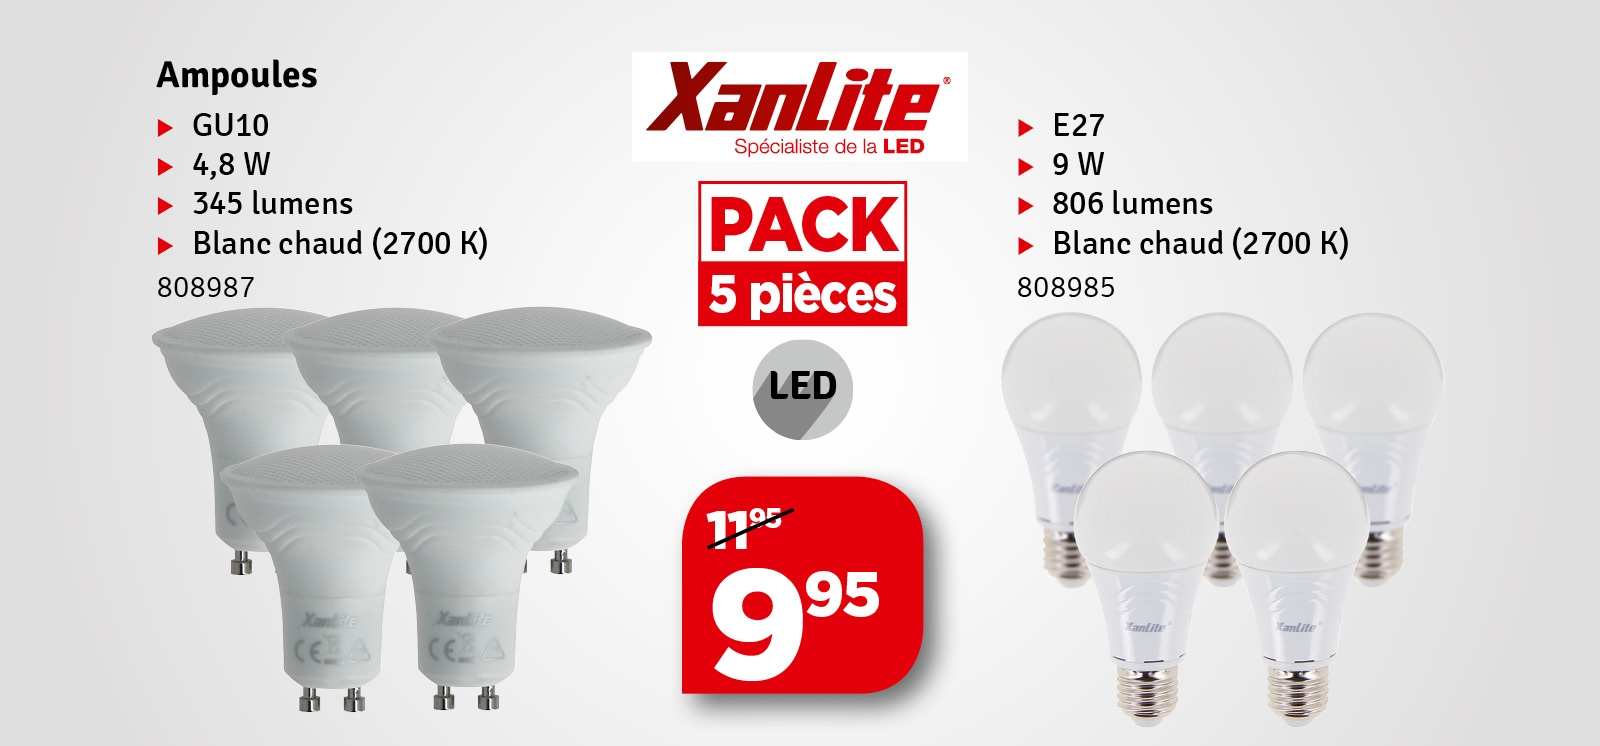 Promo - Ampoule LED GU10 50 W 5 pièces XANLITE